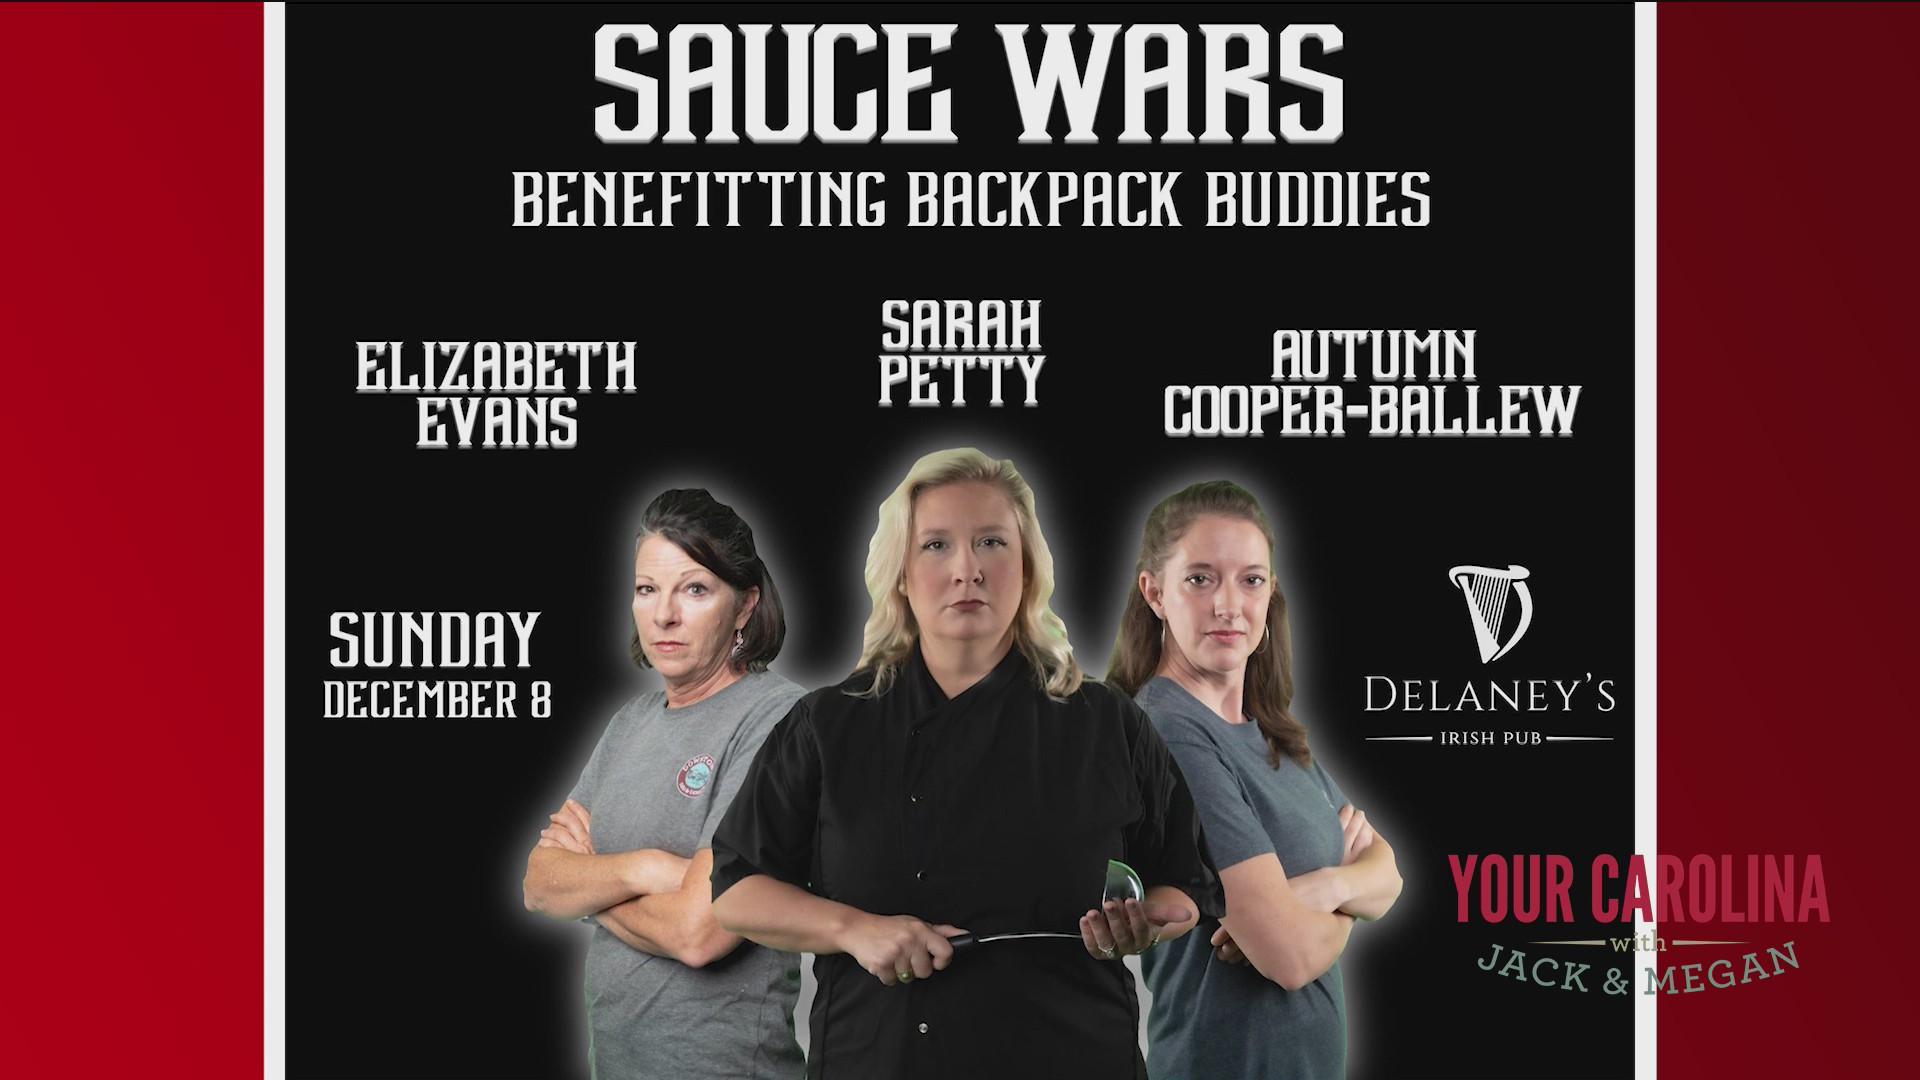 Sauce Wars For Back Pack Buddies